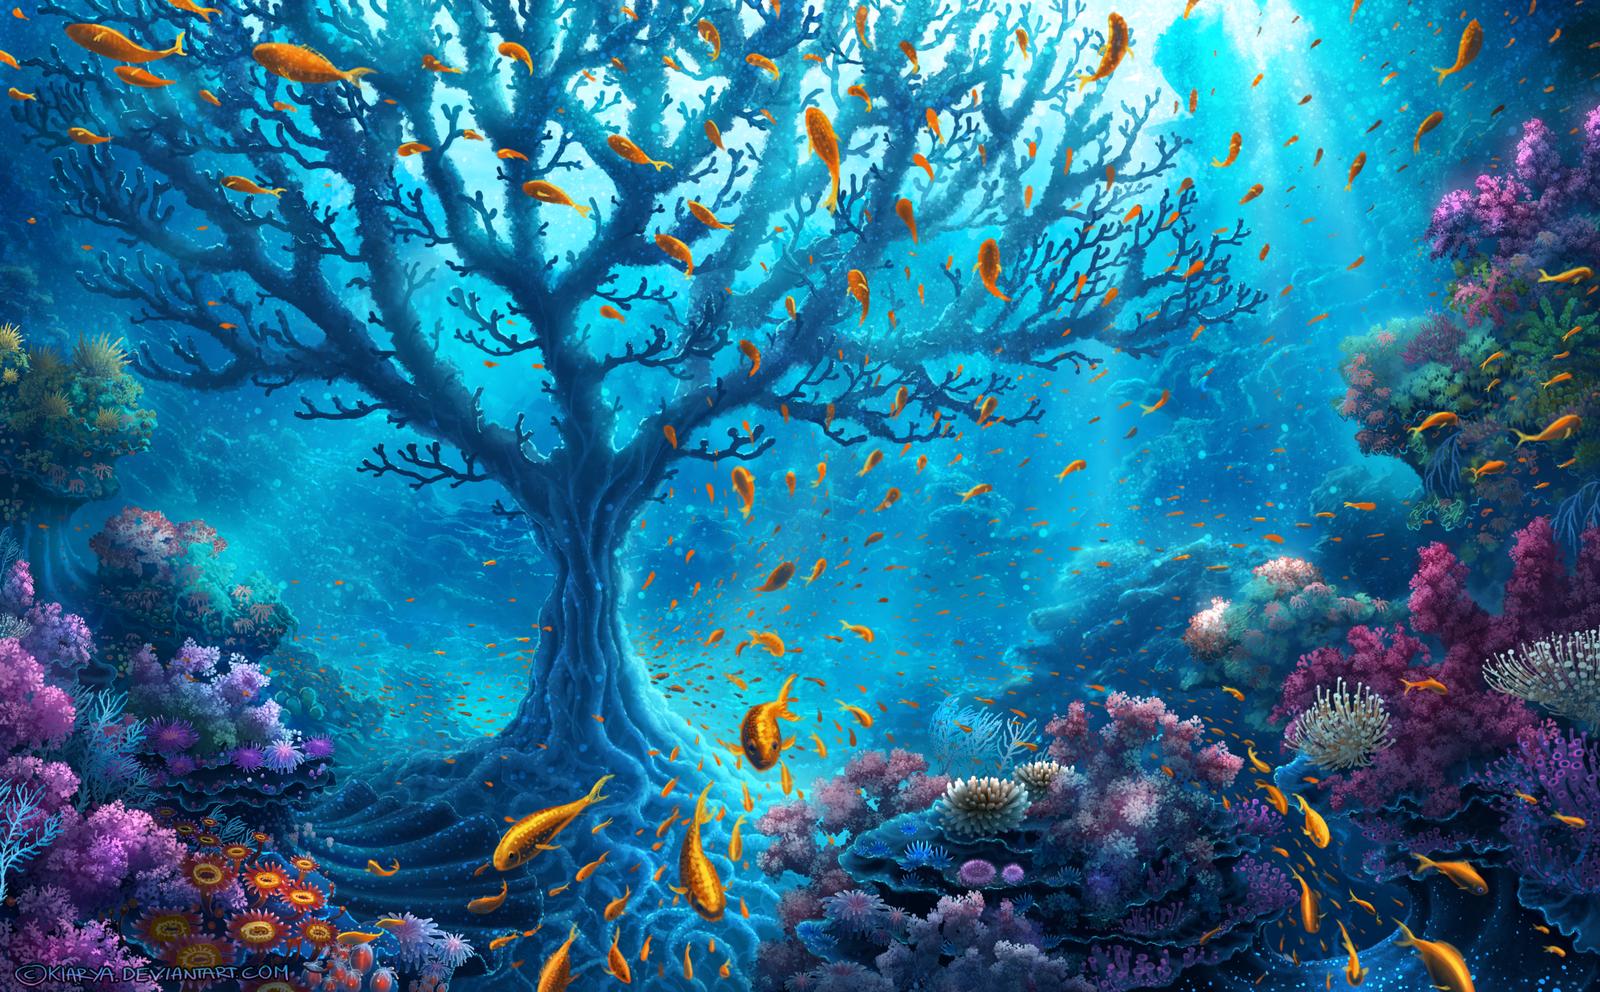 Undersea Place Underwater Art Underwater Background Underwater Painting